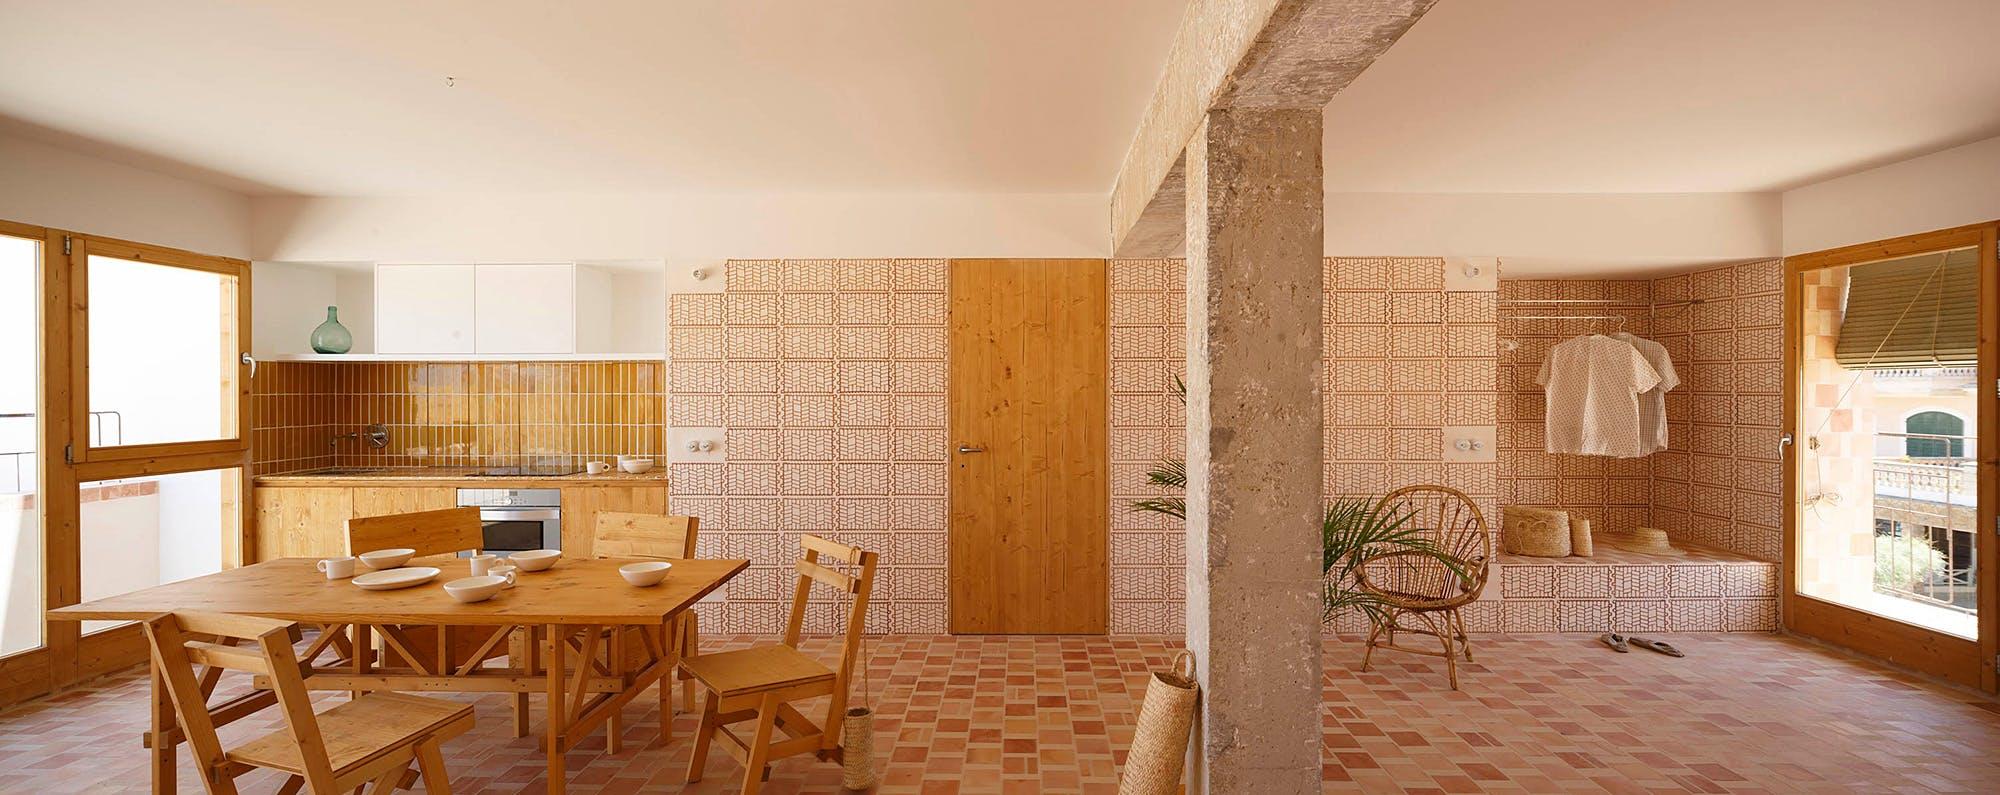 The winning 2017 Tile of Spain architecture + interior design ...